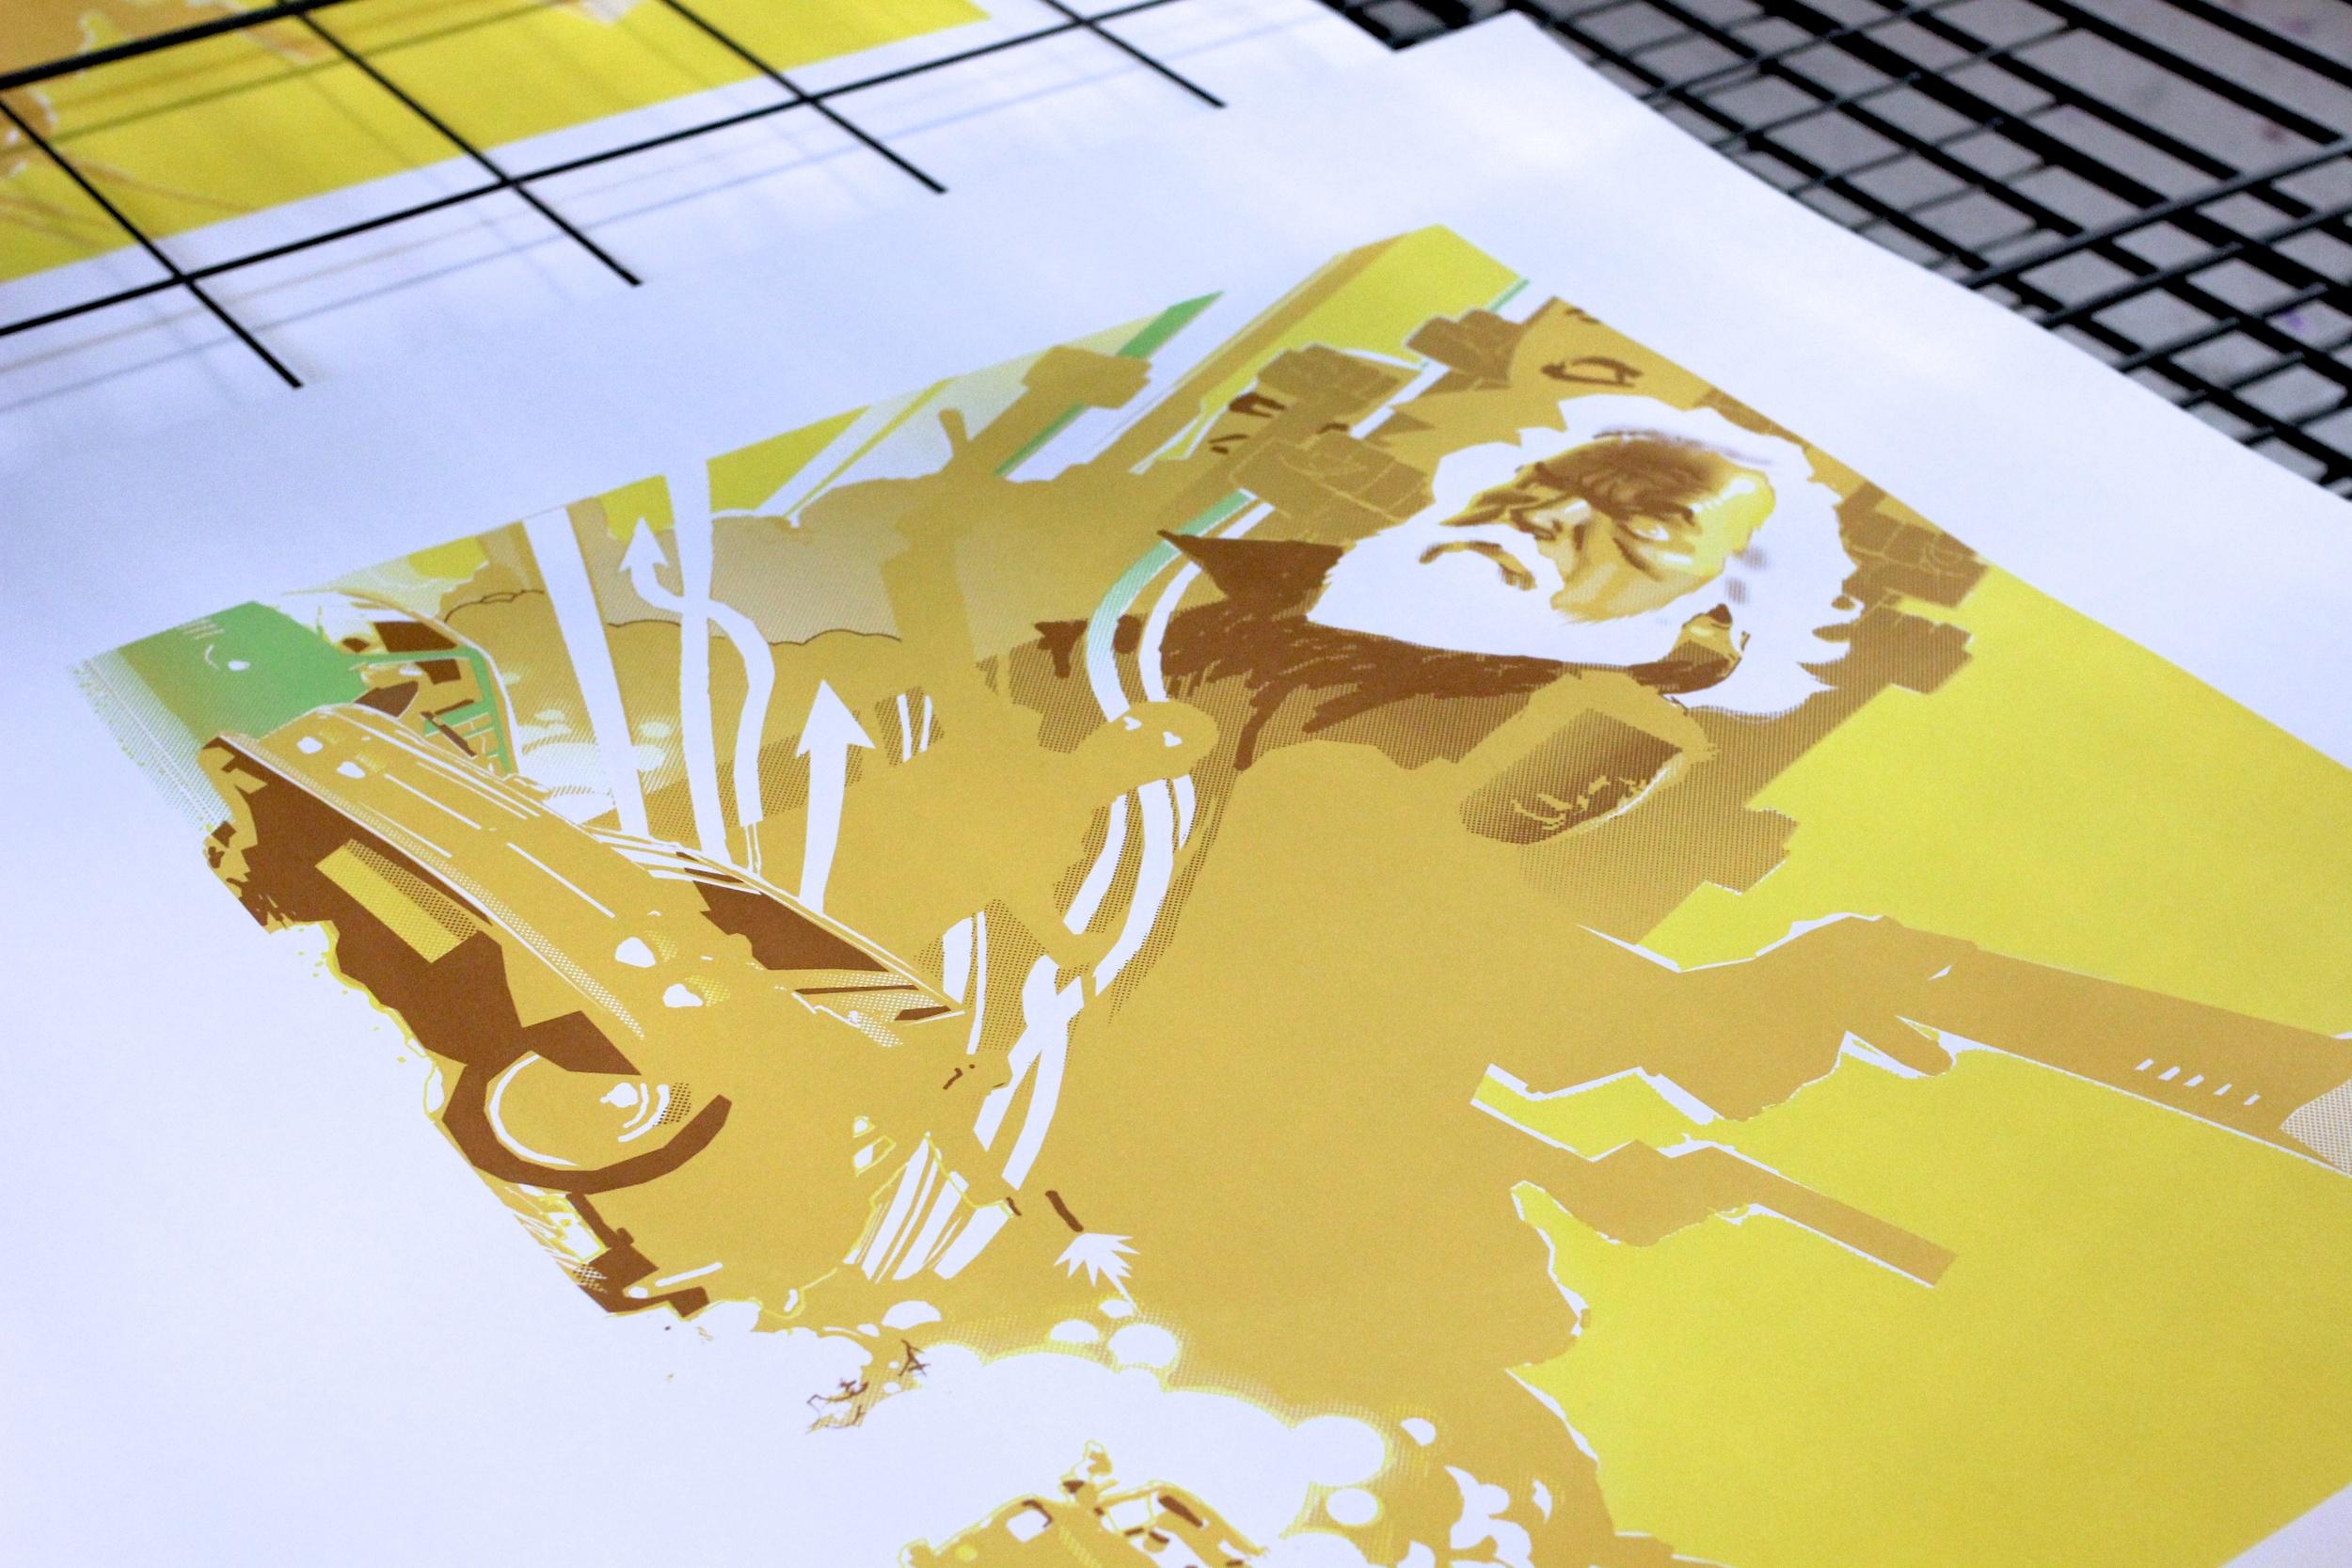 Detail of print in progress